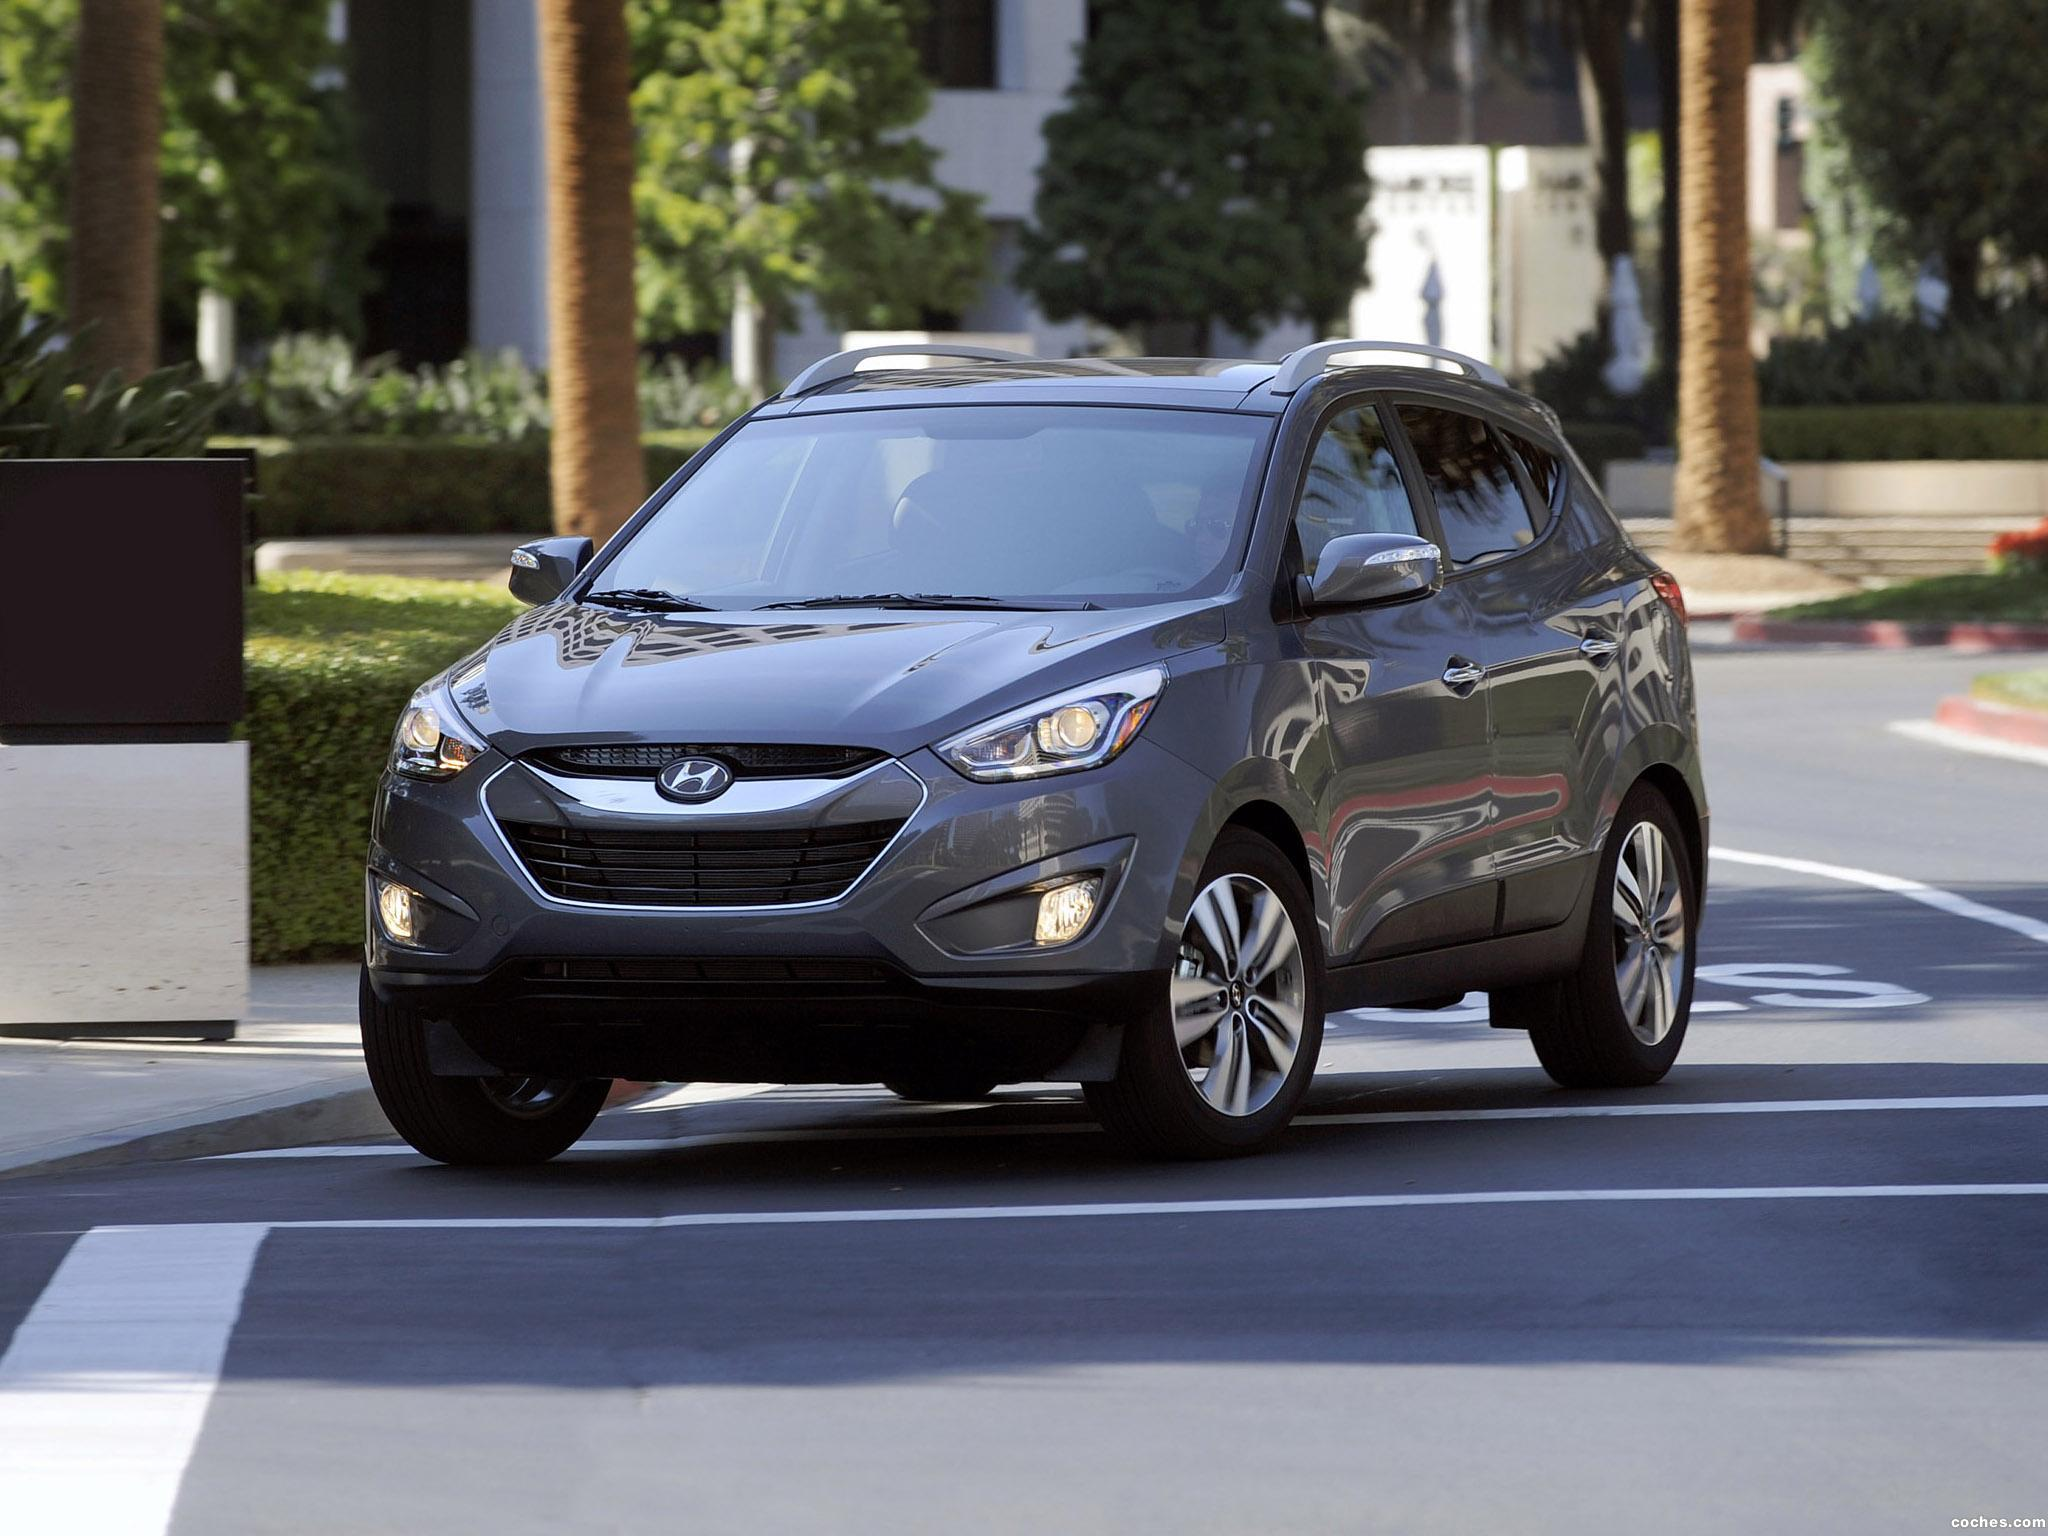 Fotos de Hyundai Tucson USA 2014